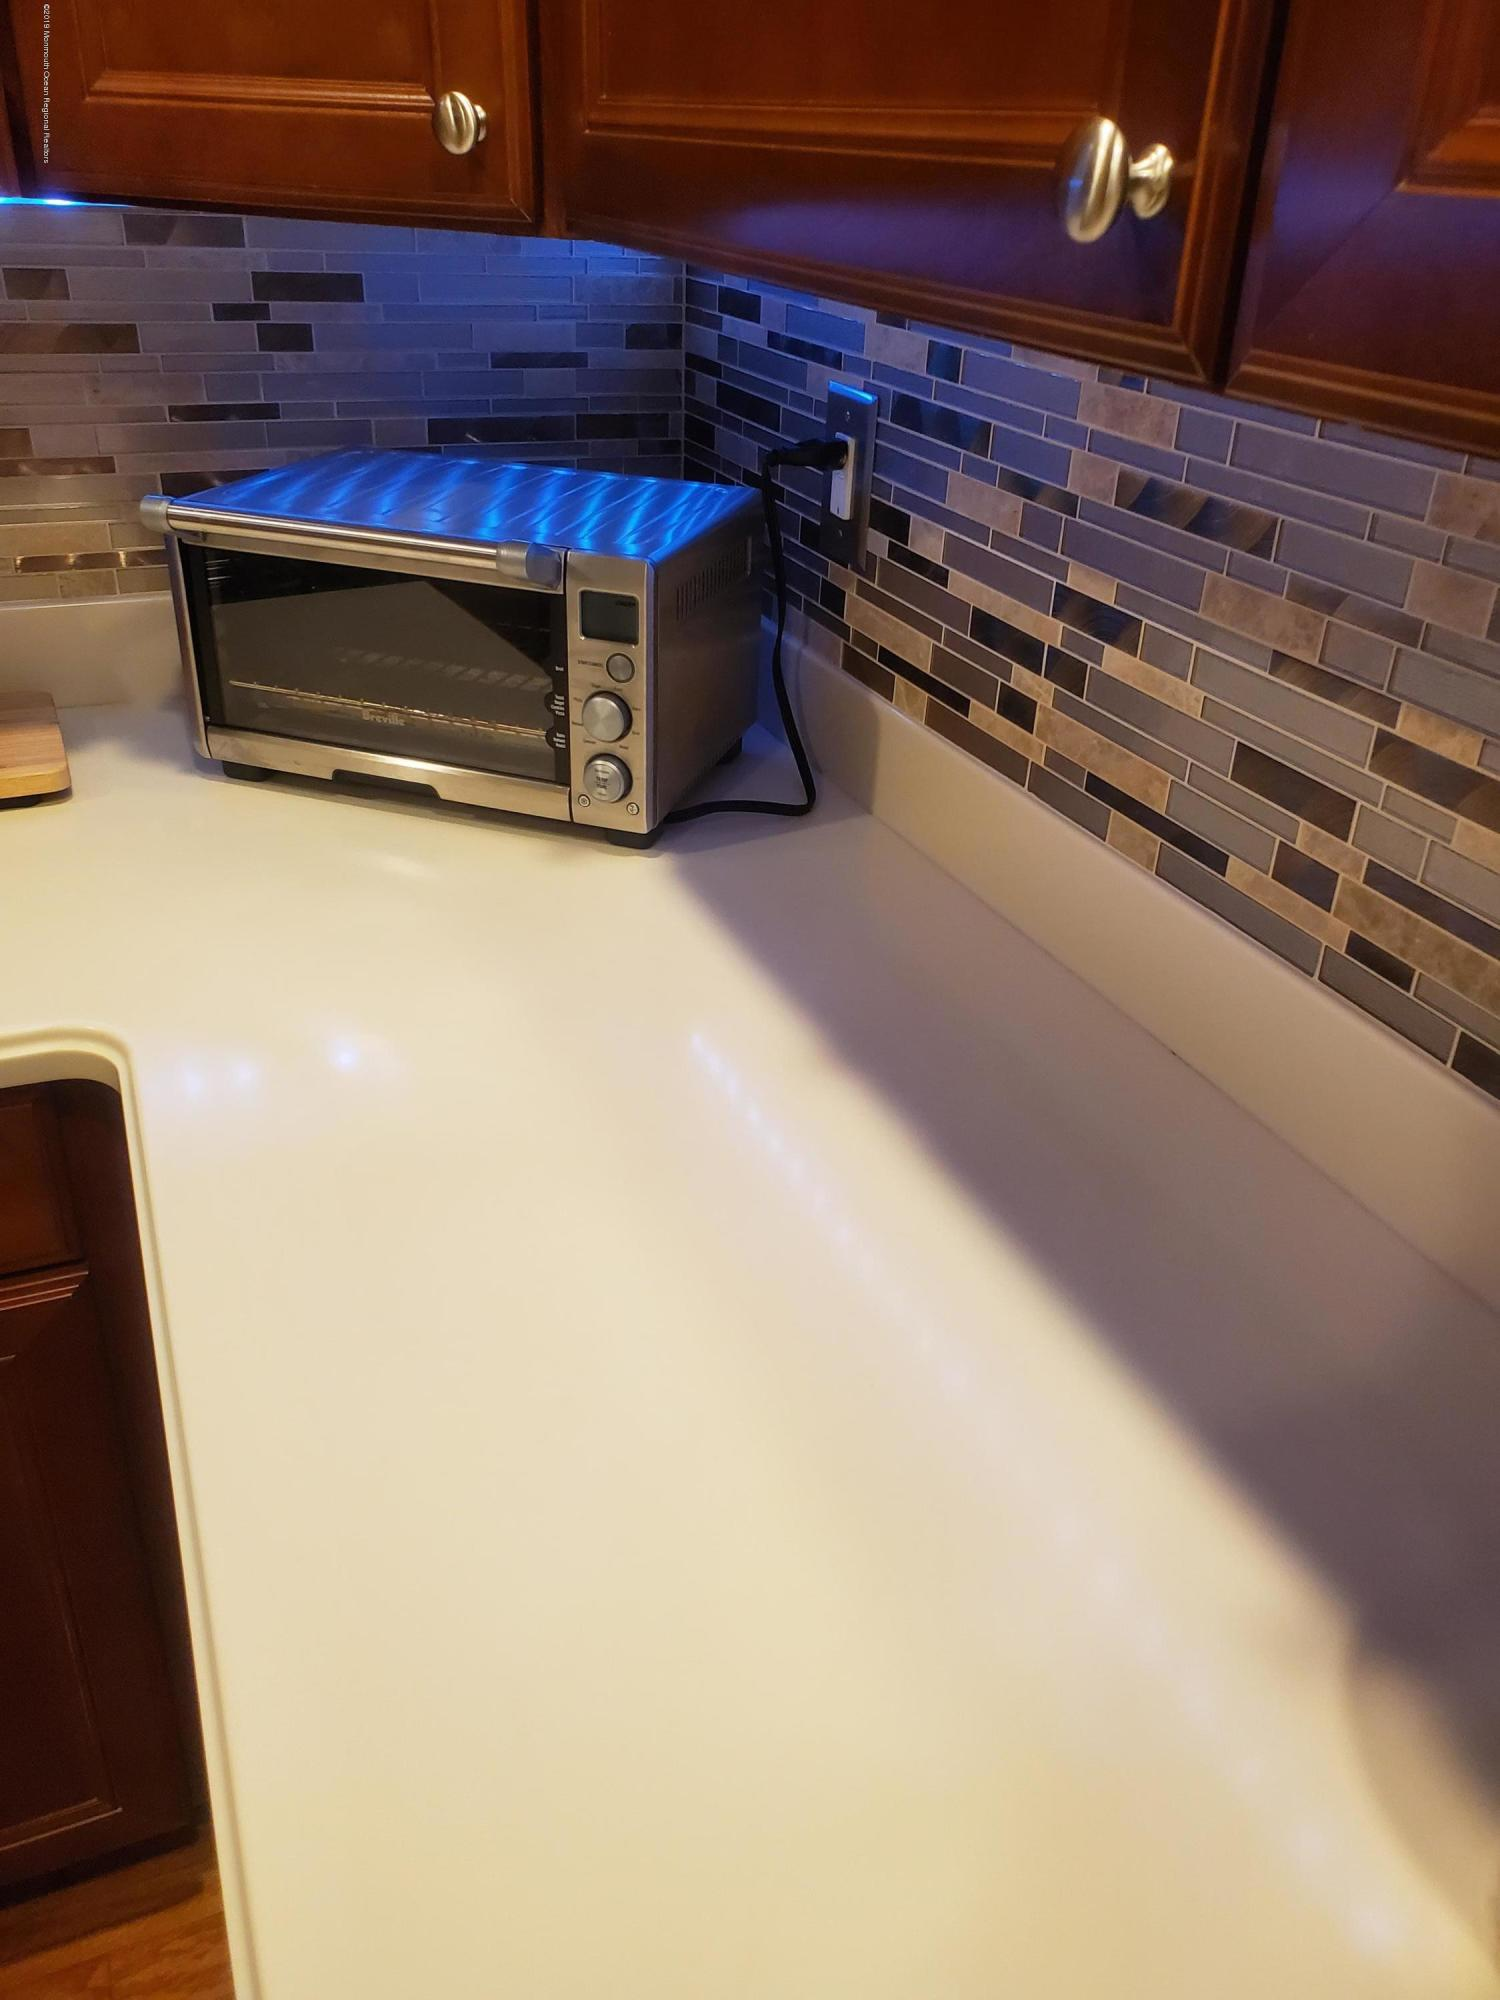 Kitchen Counter/Backsplash